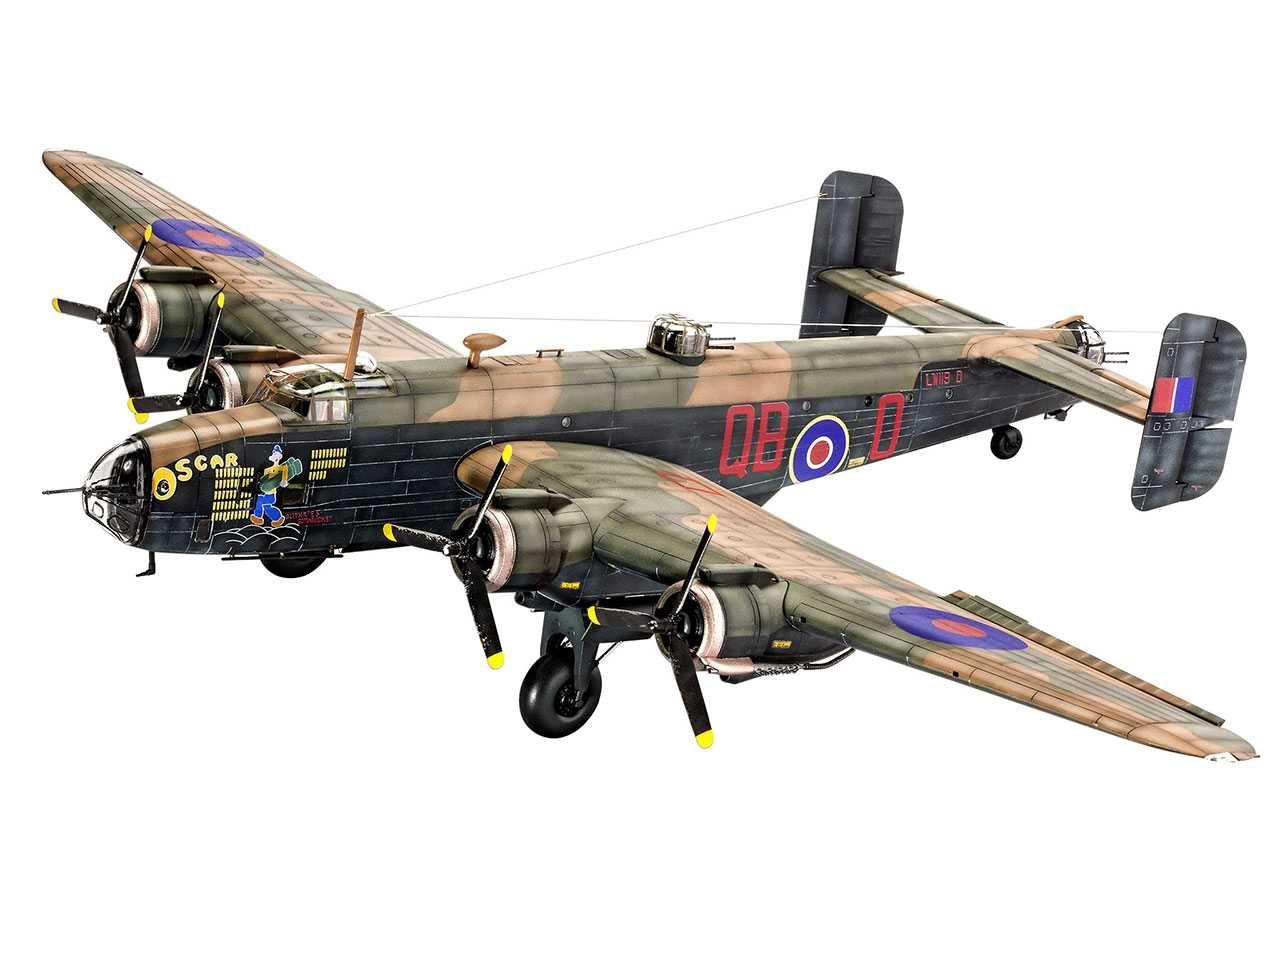 Plastic ModelKit letadlo 04936 - Handley Page Halifax Mk.III (1:72) Plastikové modely